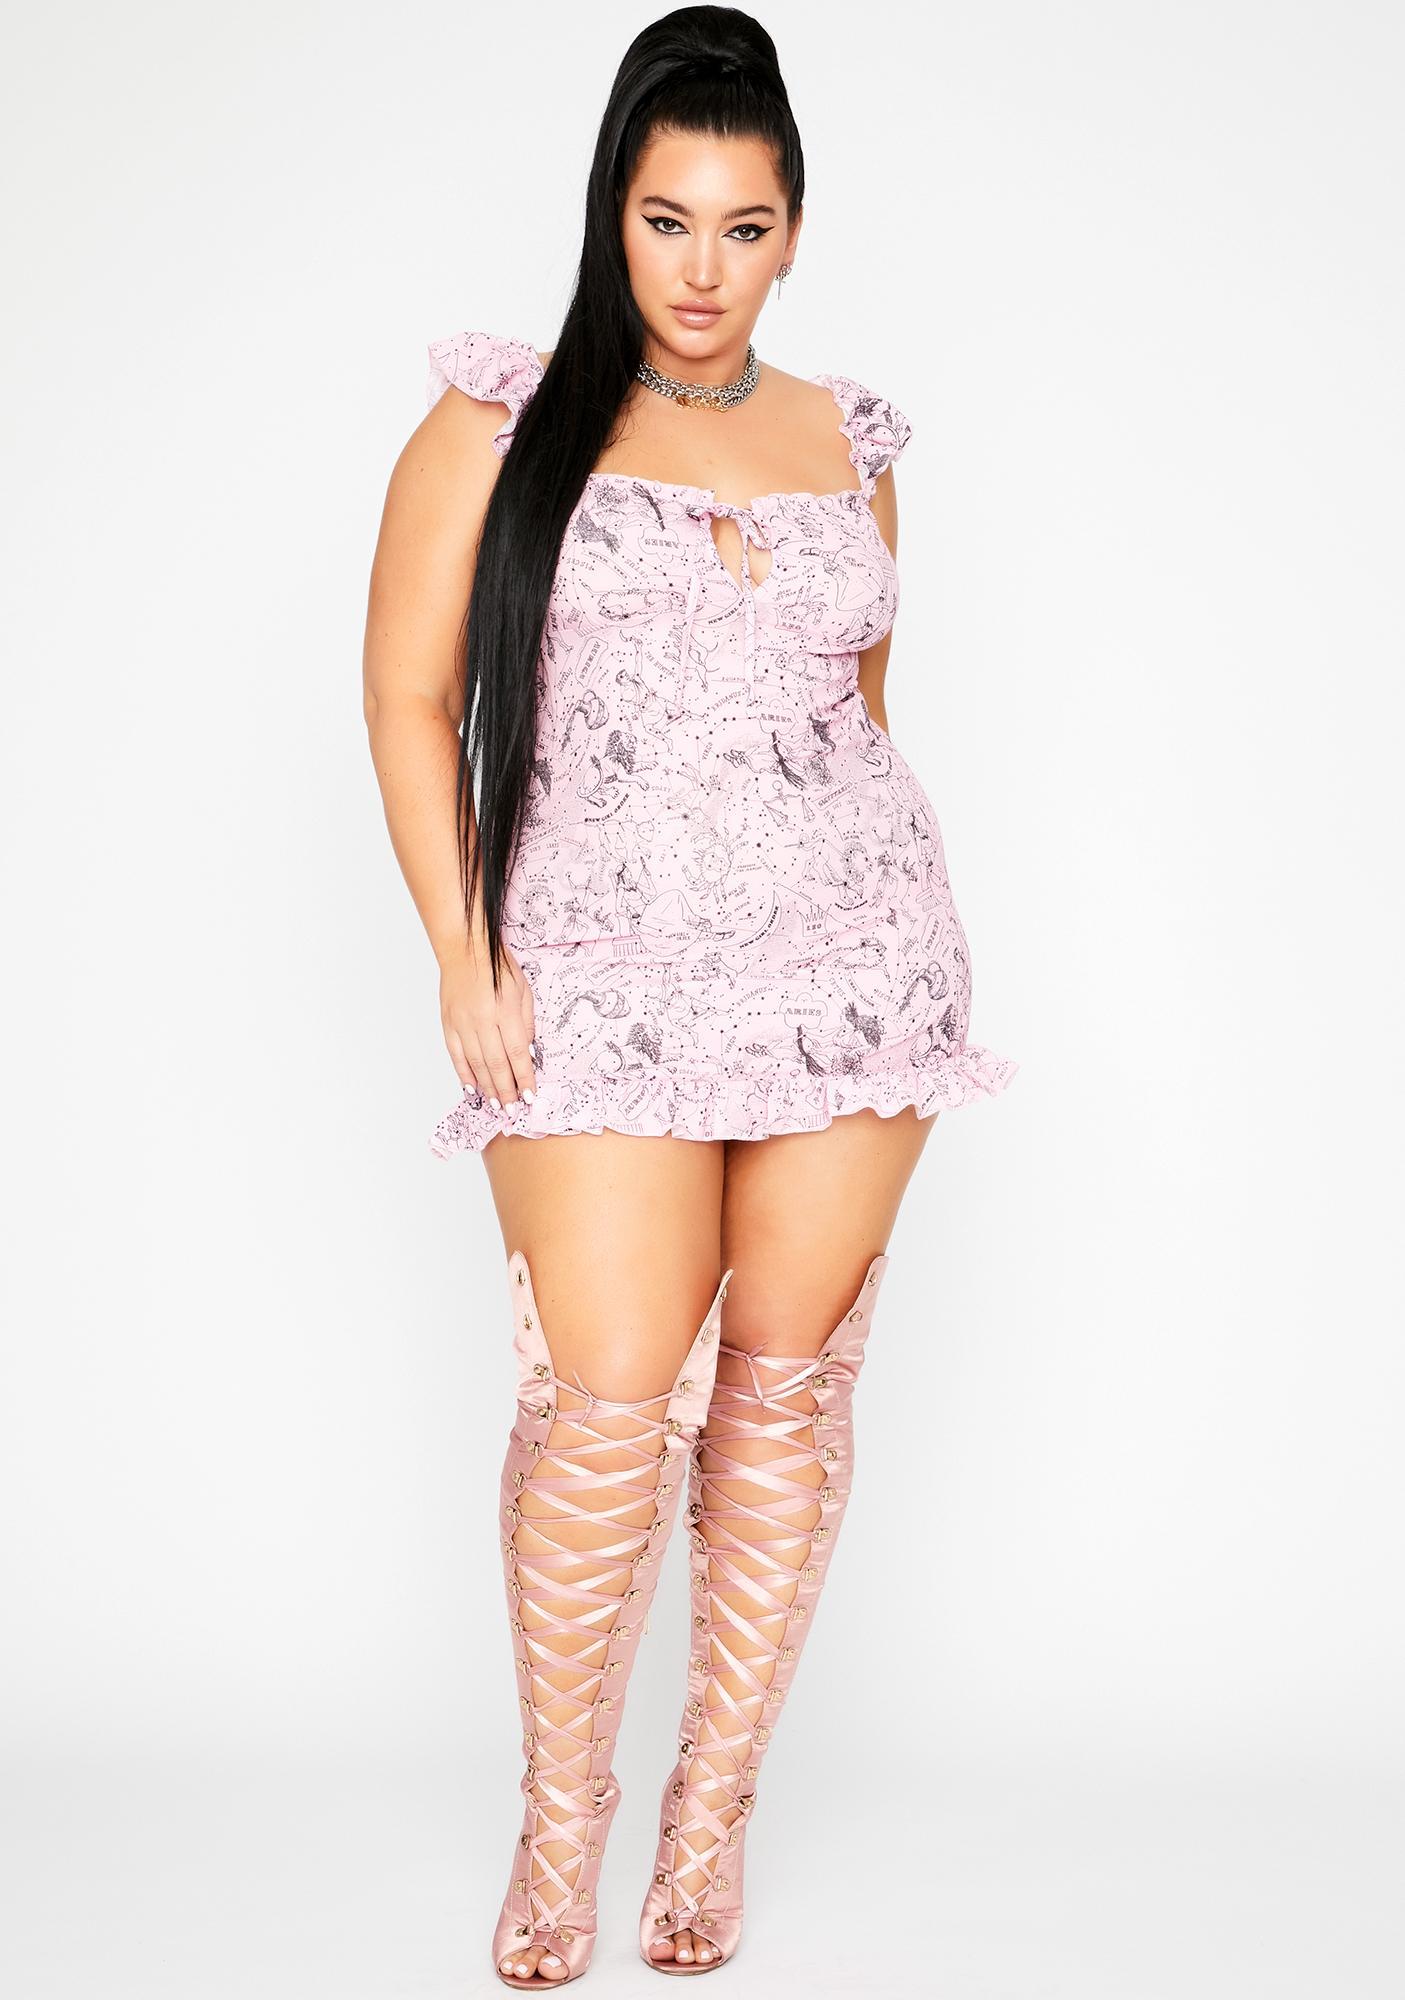 NEW GIRL ORDER Cute Constellation Dress